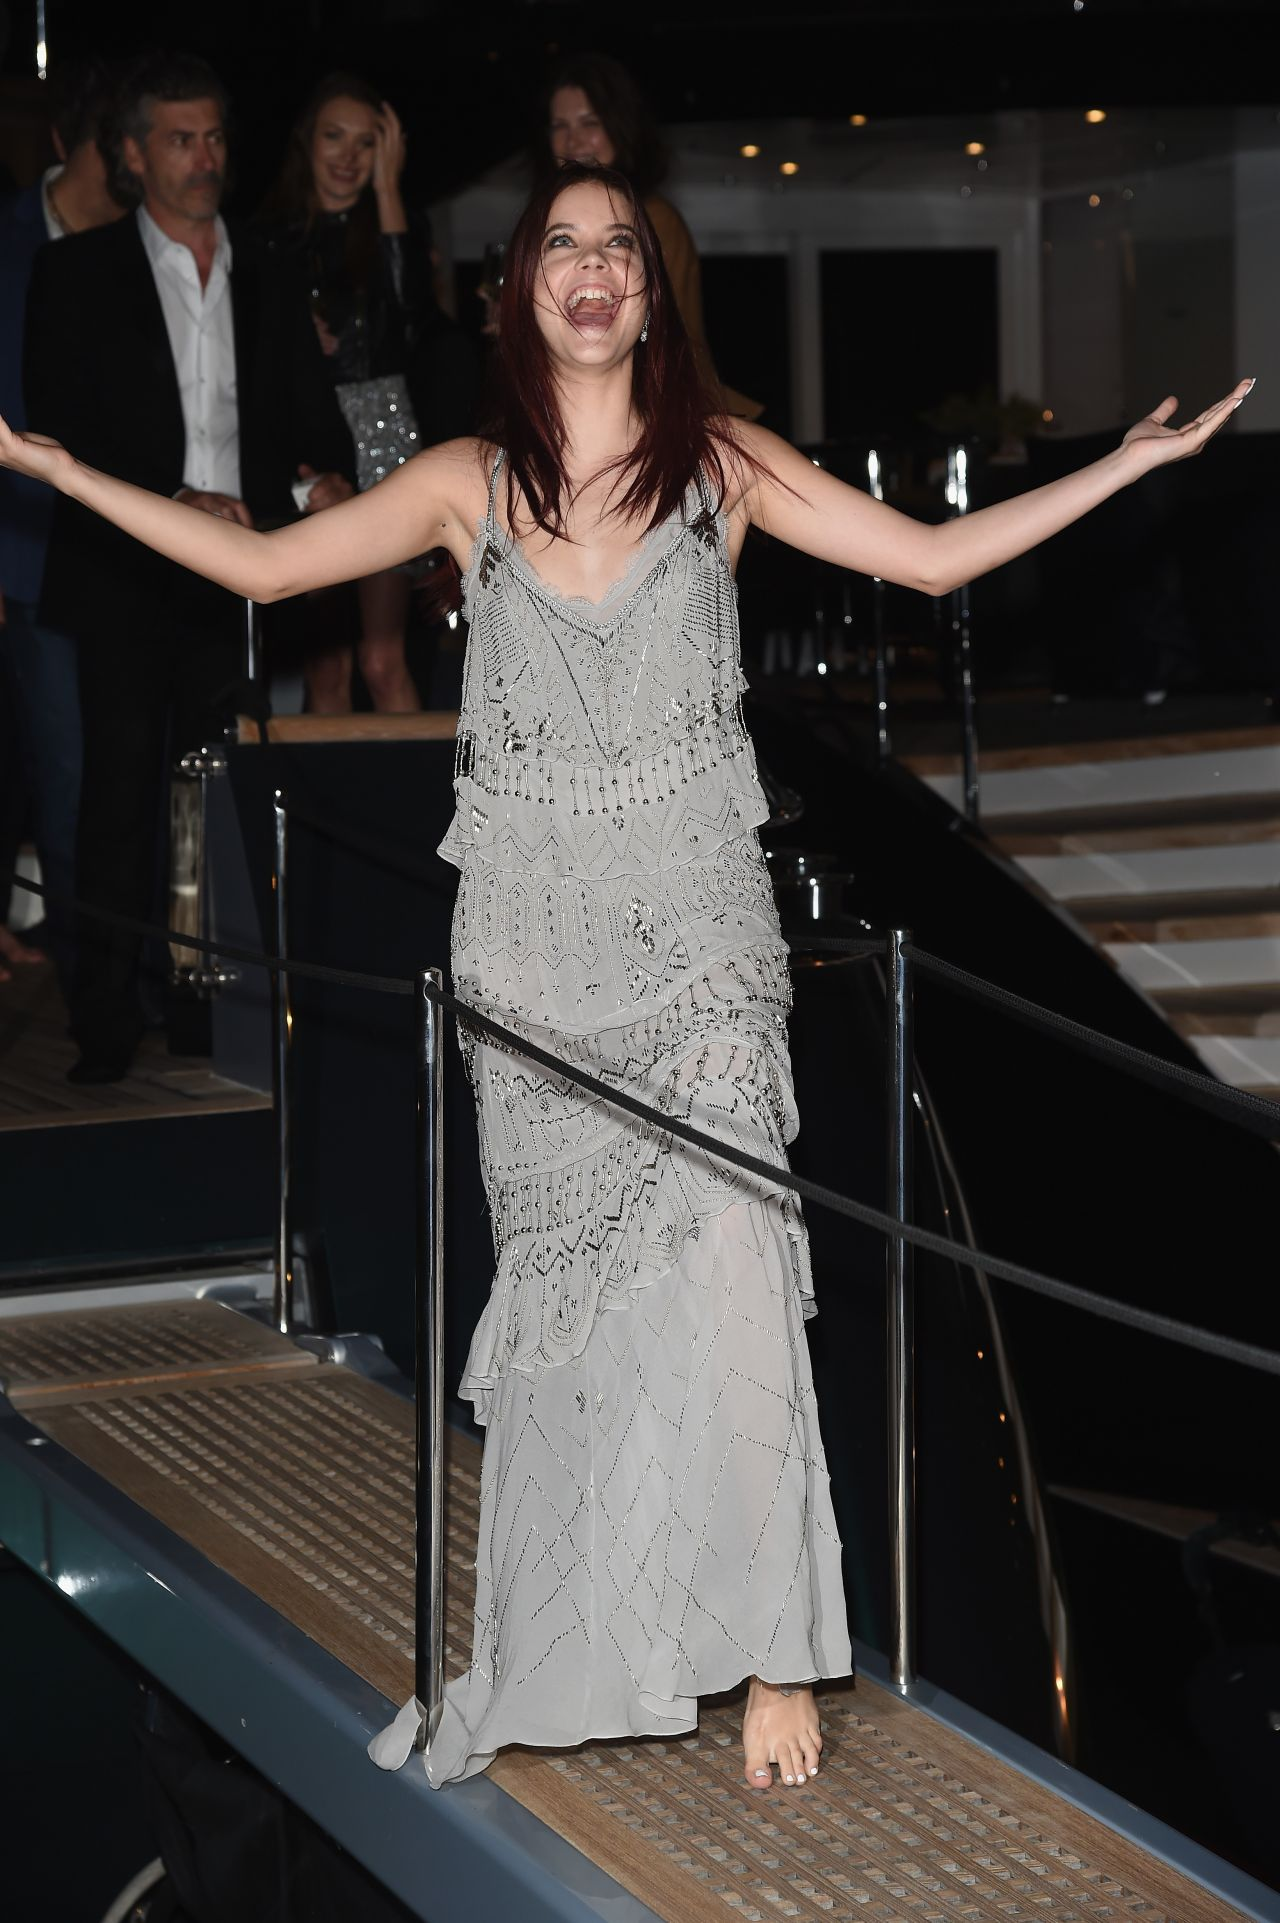 Barbara Palvin Roberto Cavalli Yacht Party 2014 Cannes